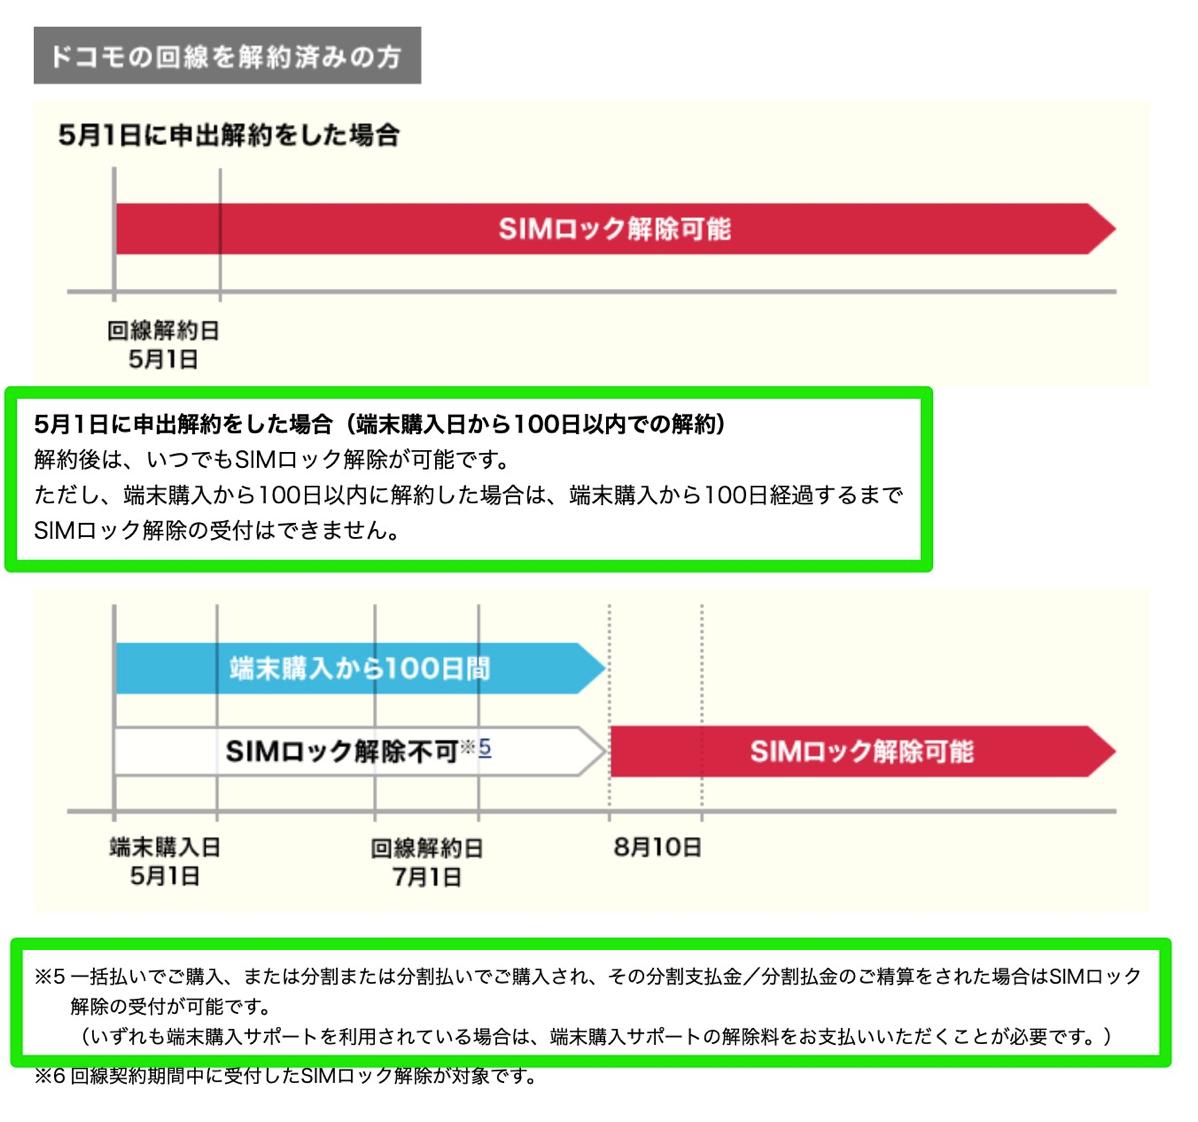 SIMロック解除に関する注意(ドコモ)